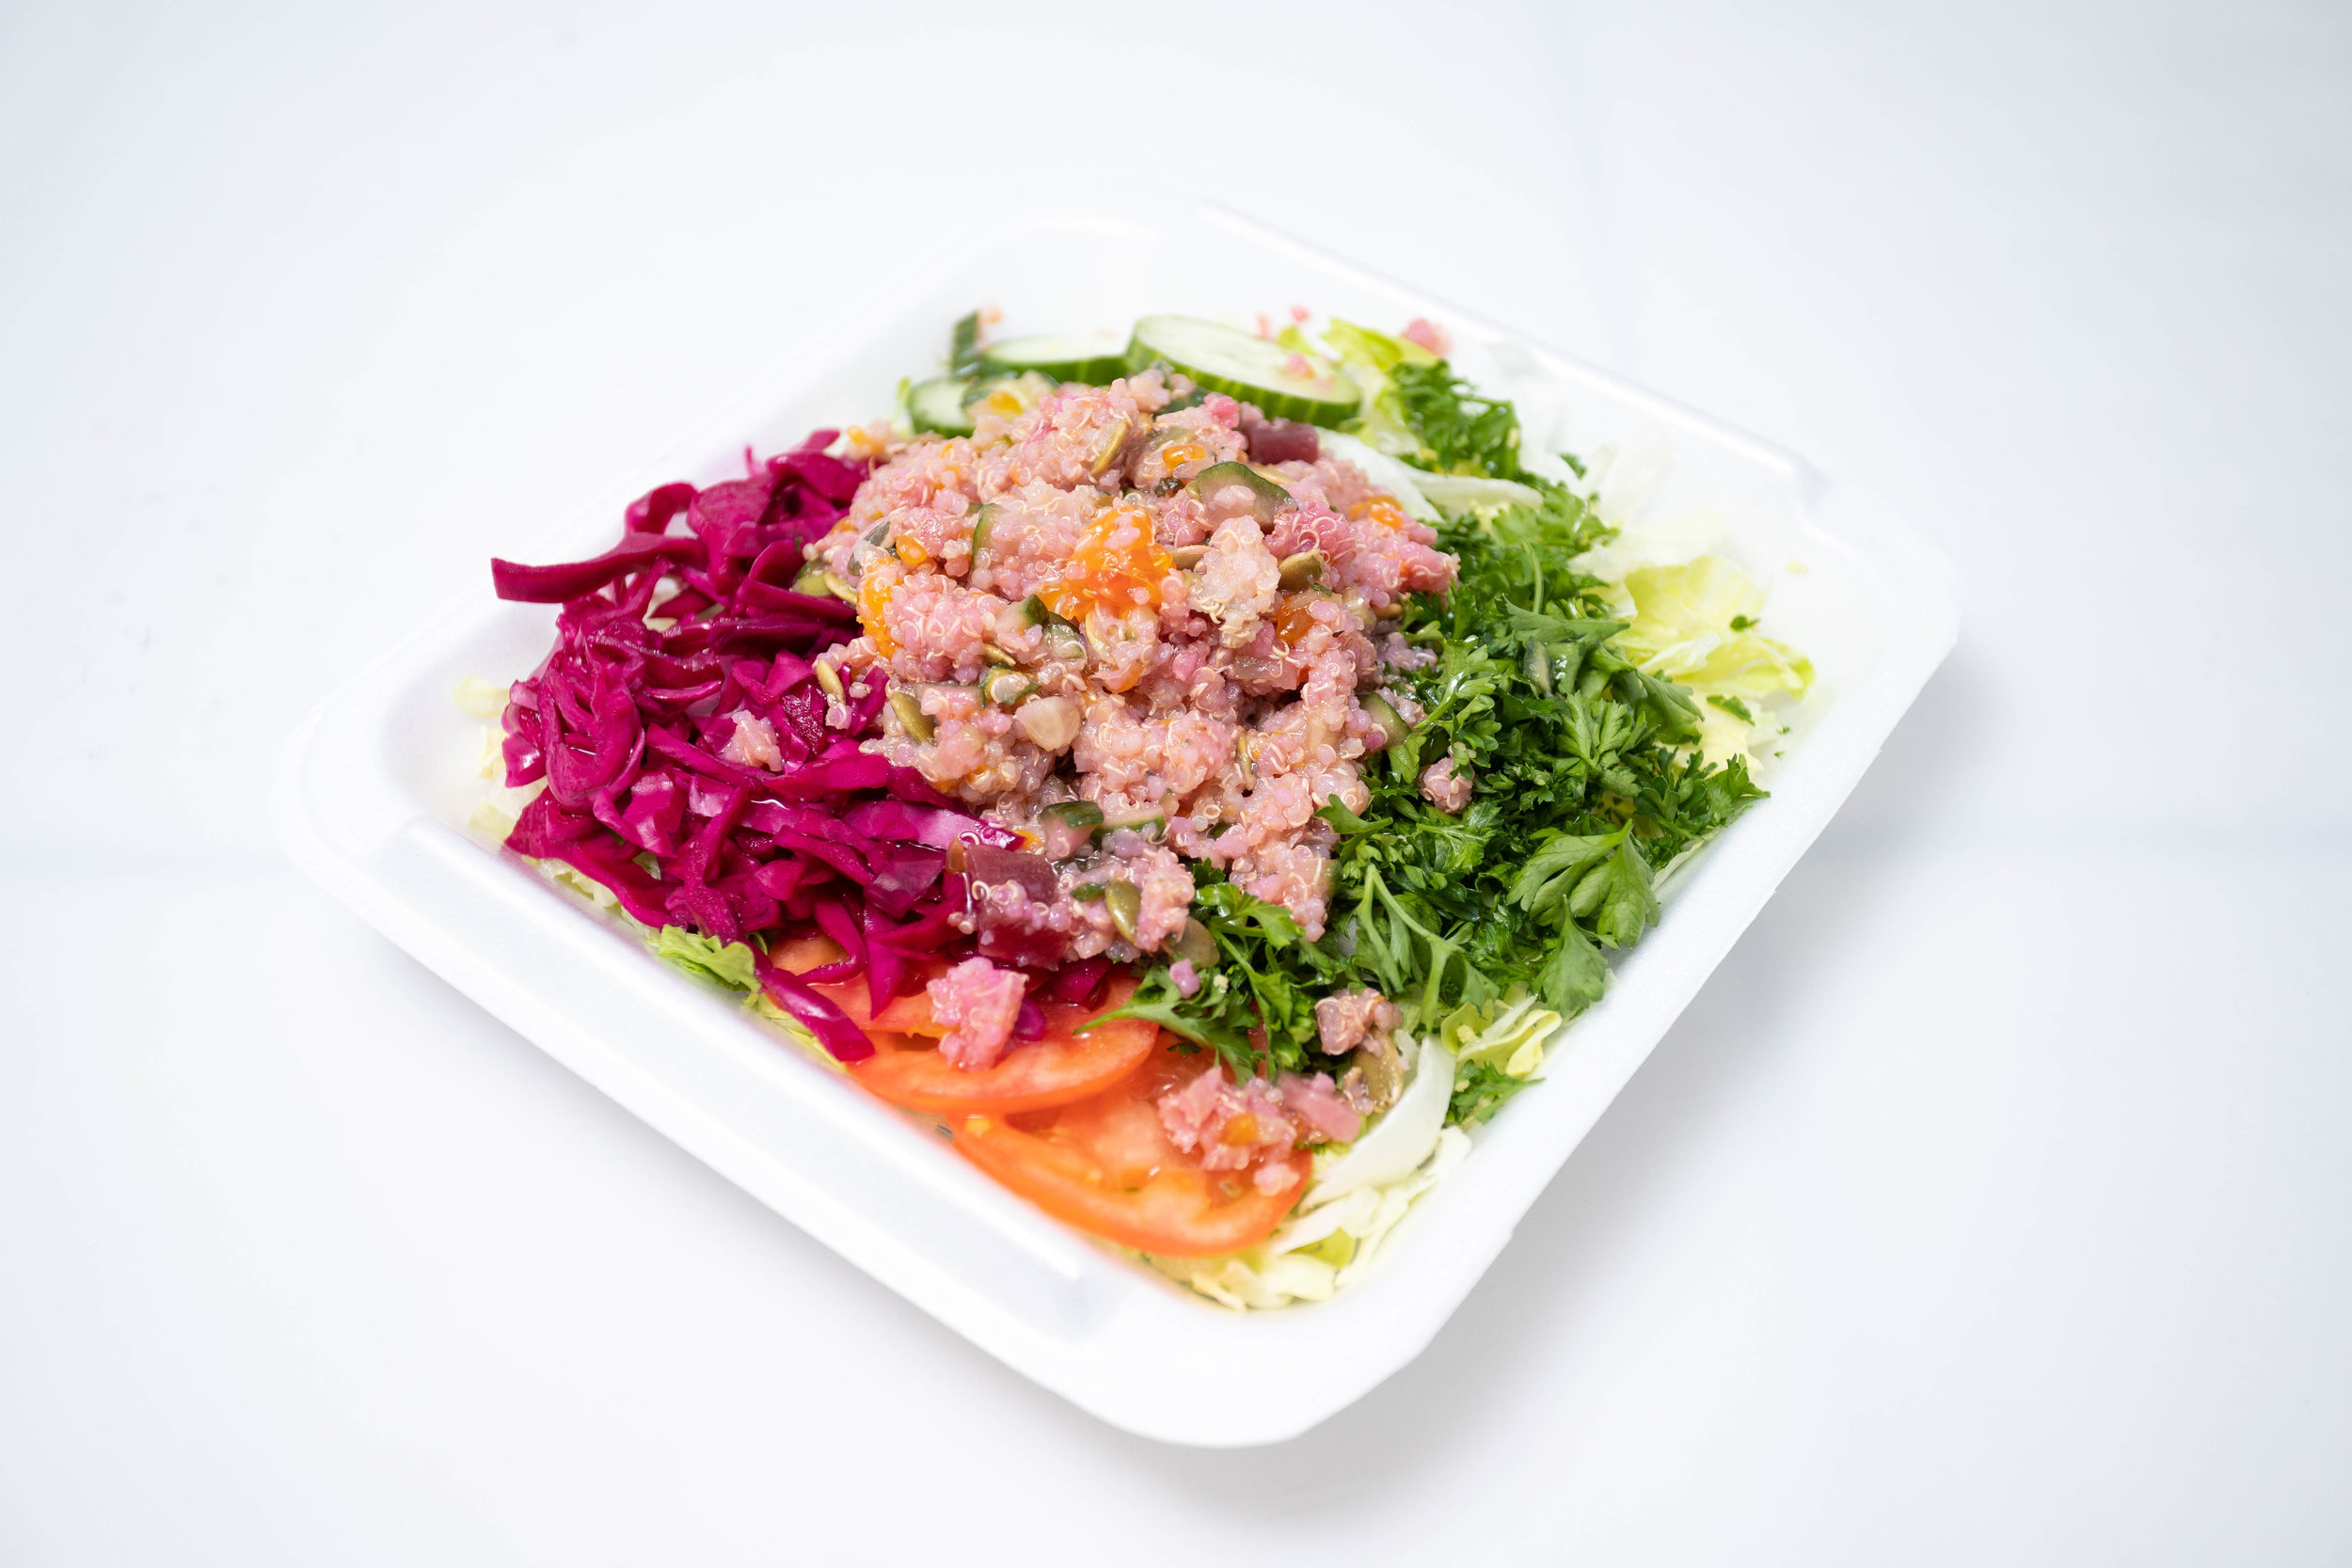 Cyprus Salads Co 21.jpg